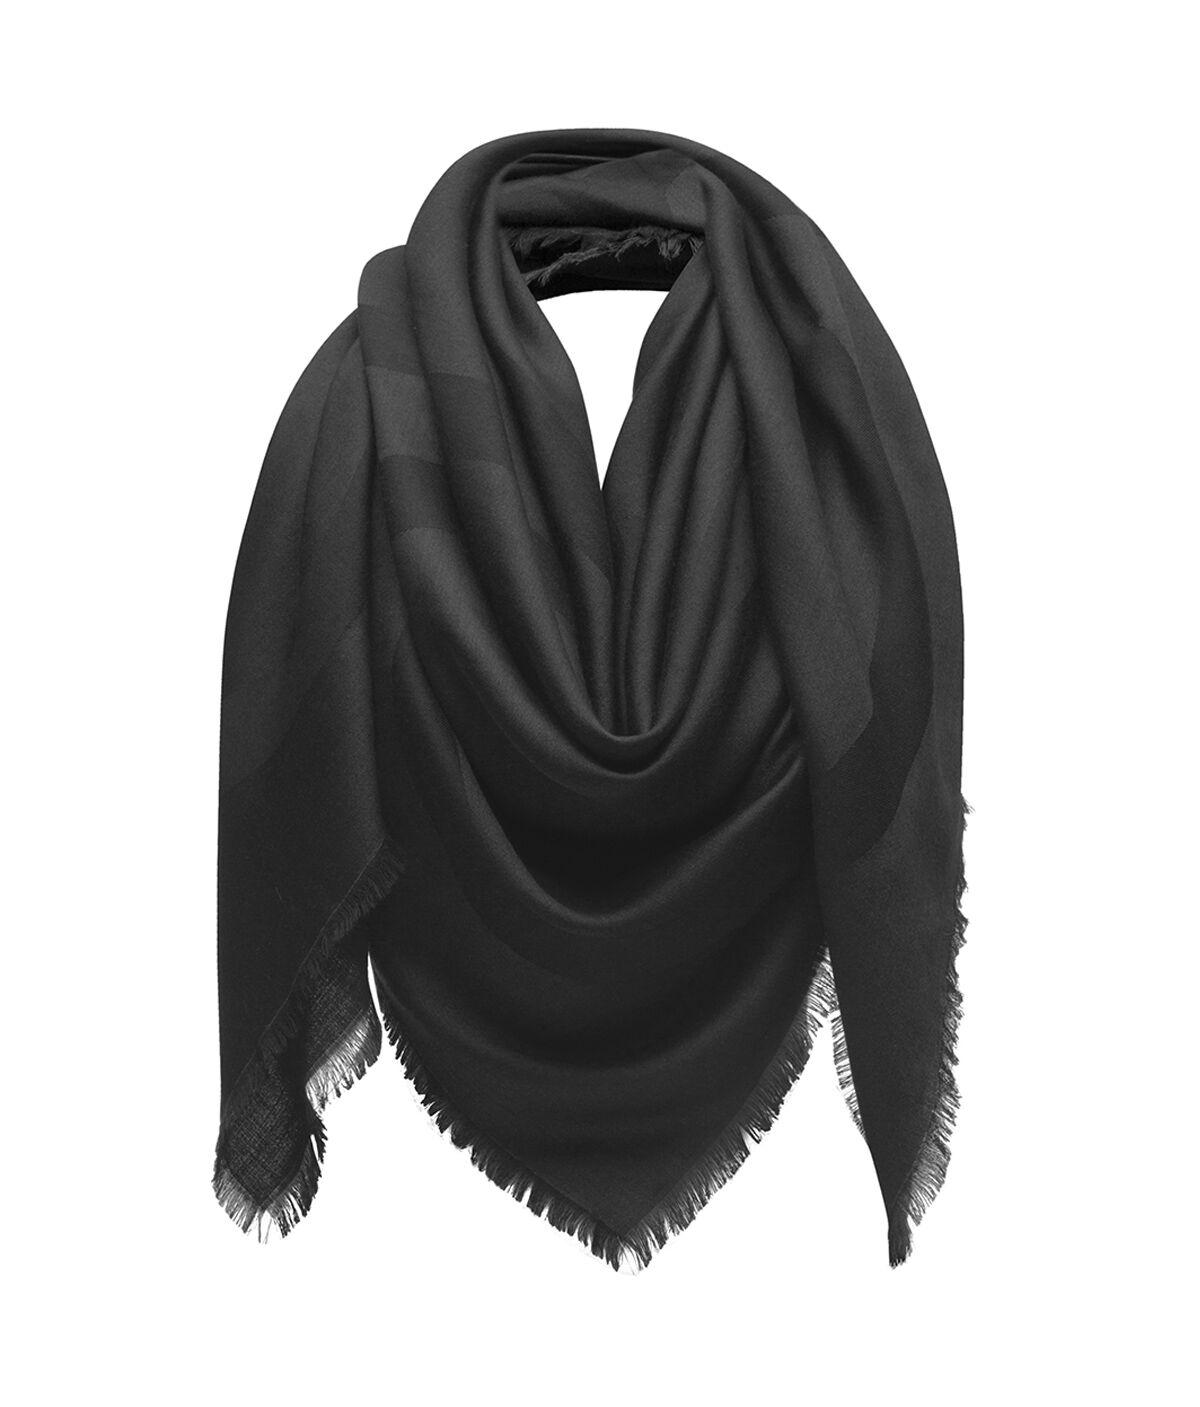 LOEWE 140X140 スカーフ ジャイアント アナグラム ブラック all